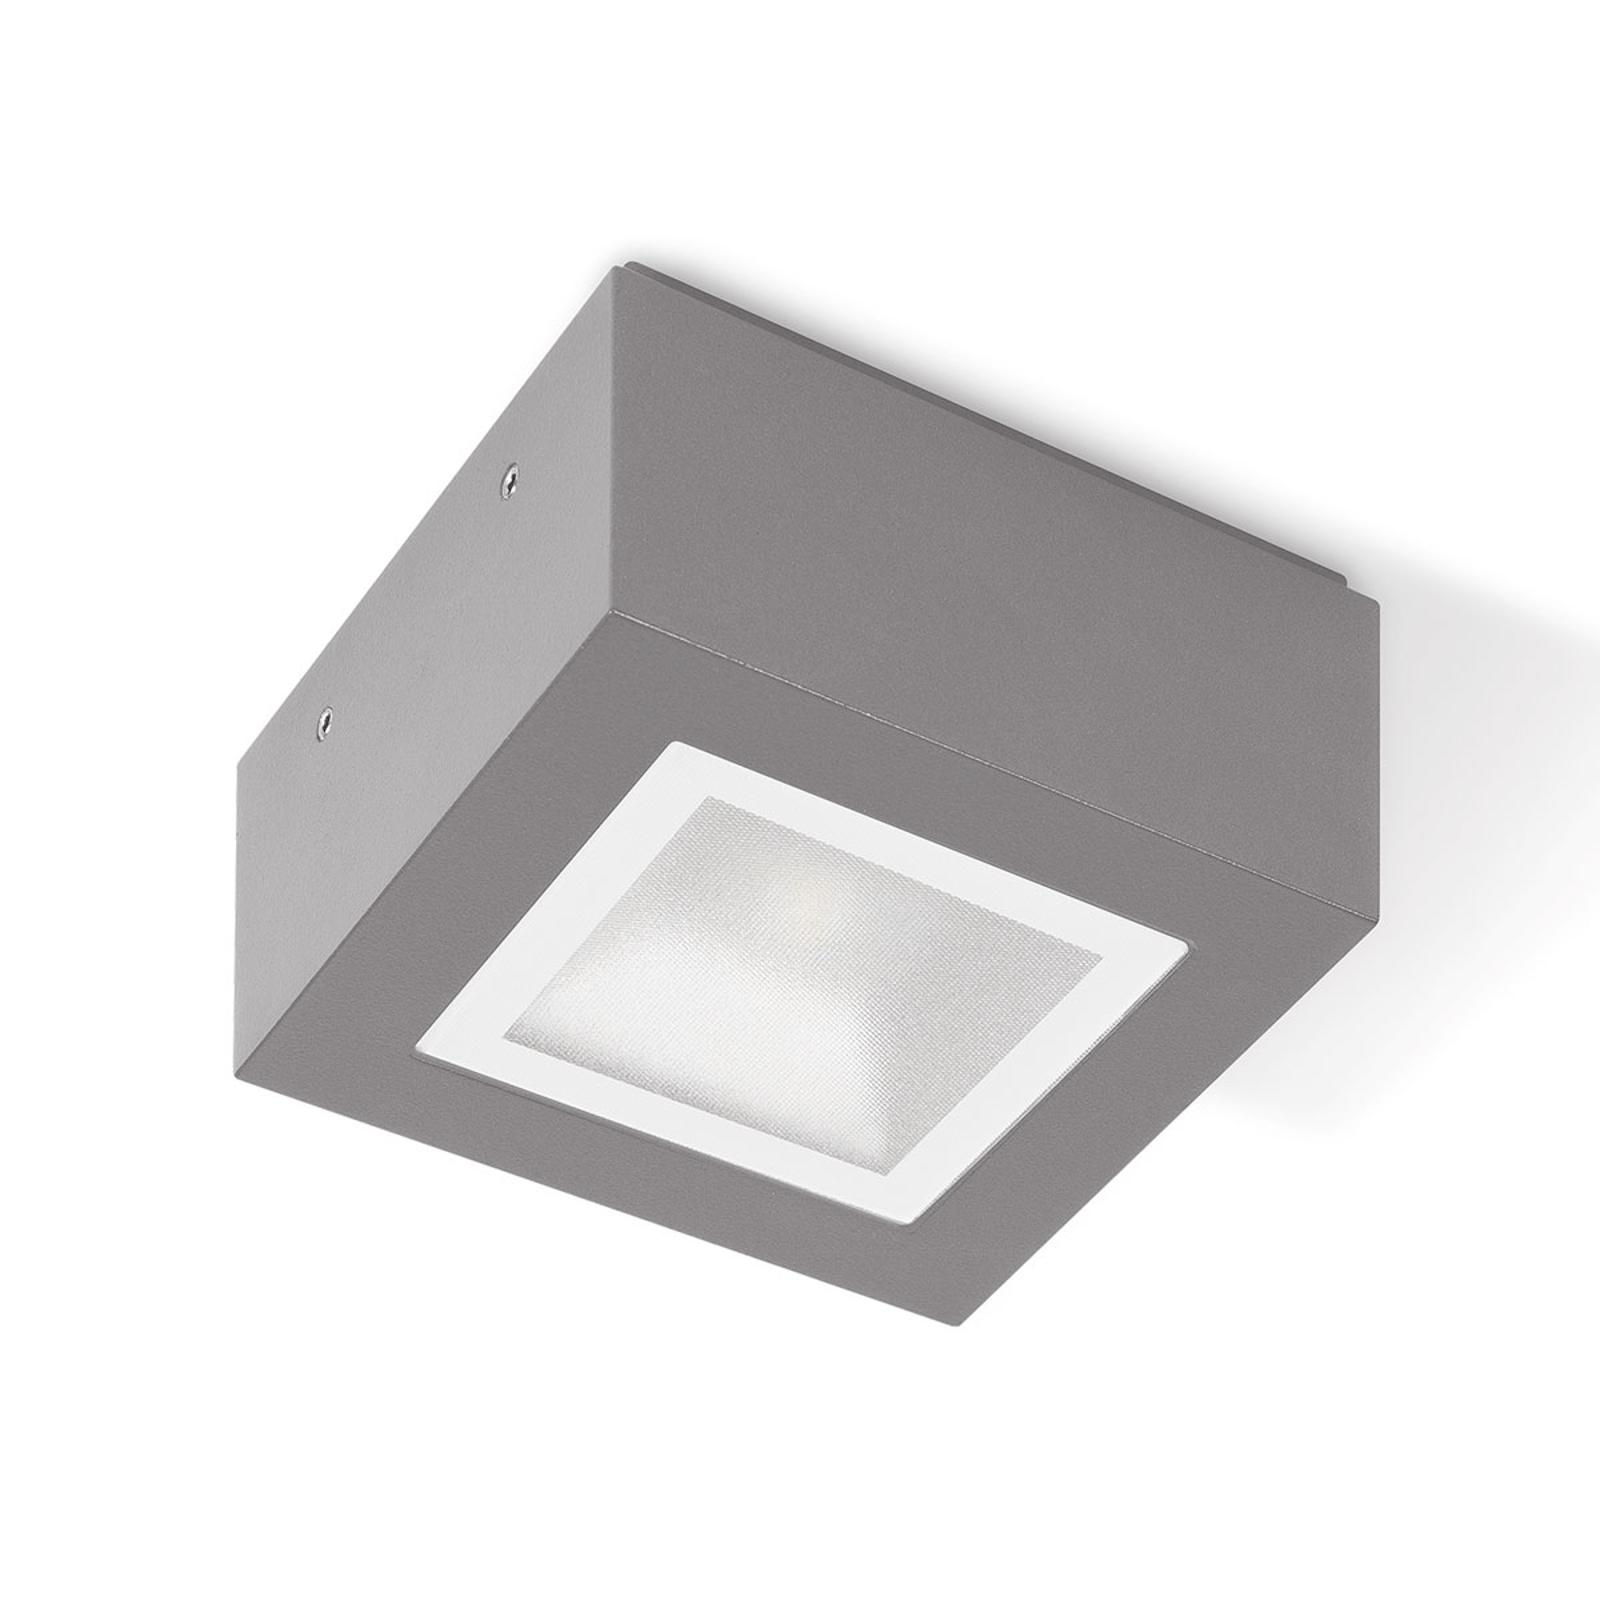 LED-kattovalaisin Mimik 10 Tech mikroprisma 4000 K